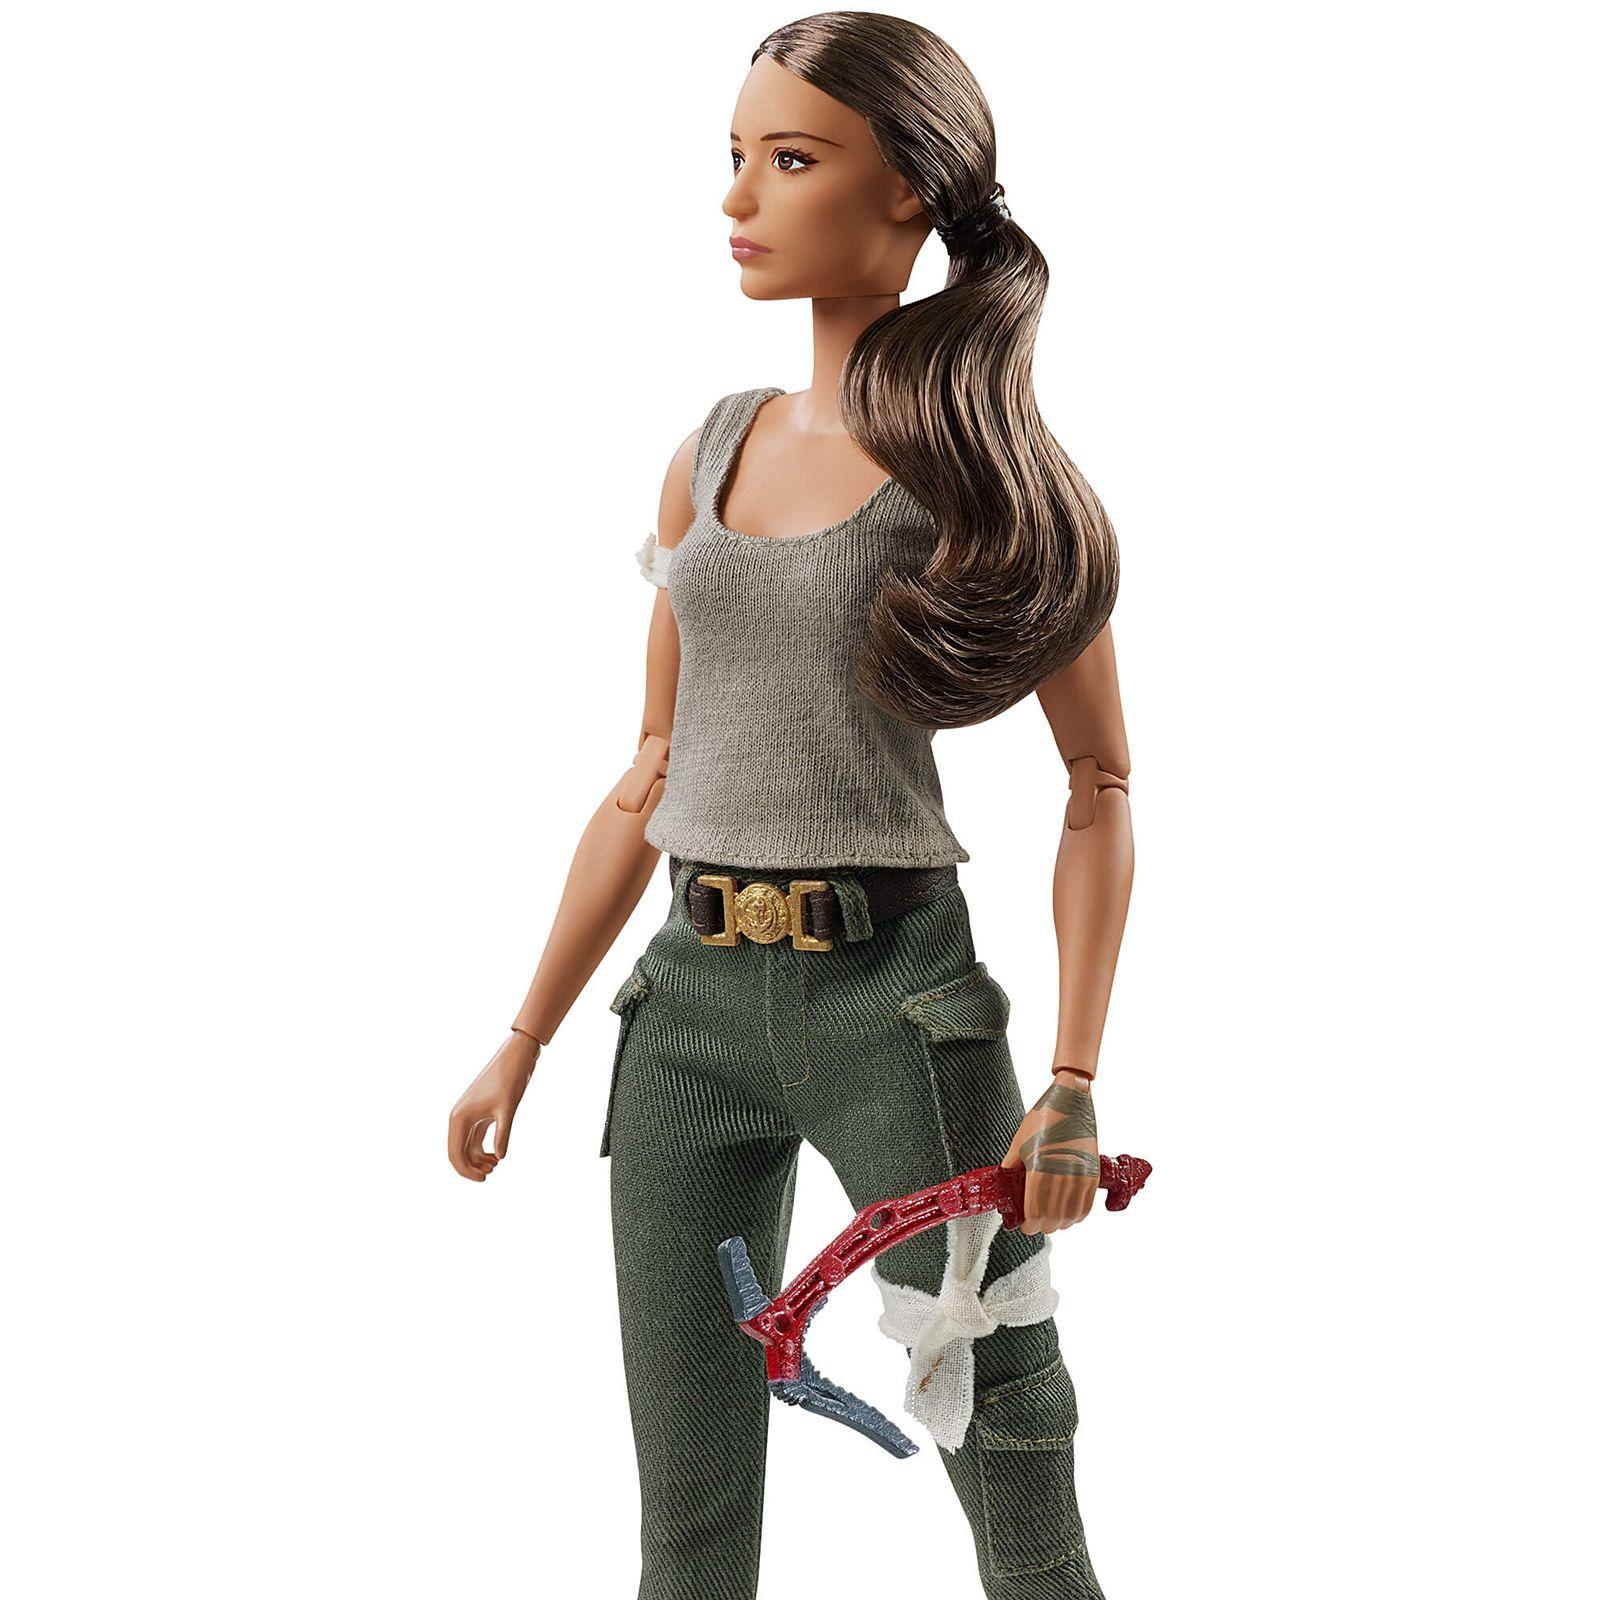 BarbieTombRaider10